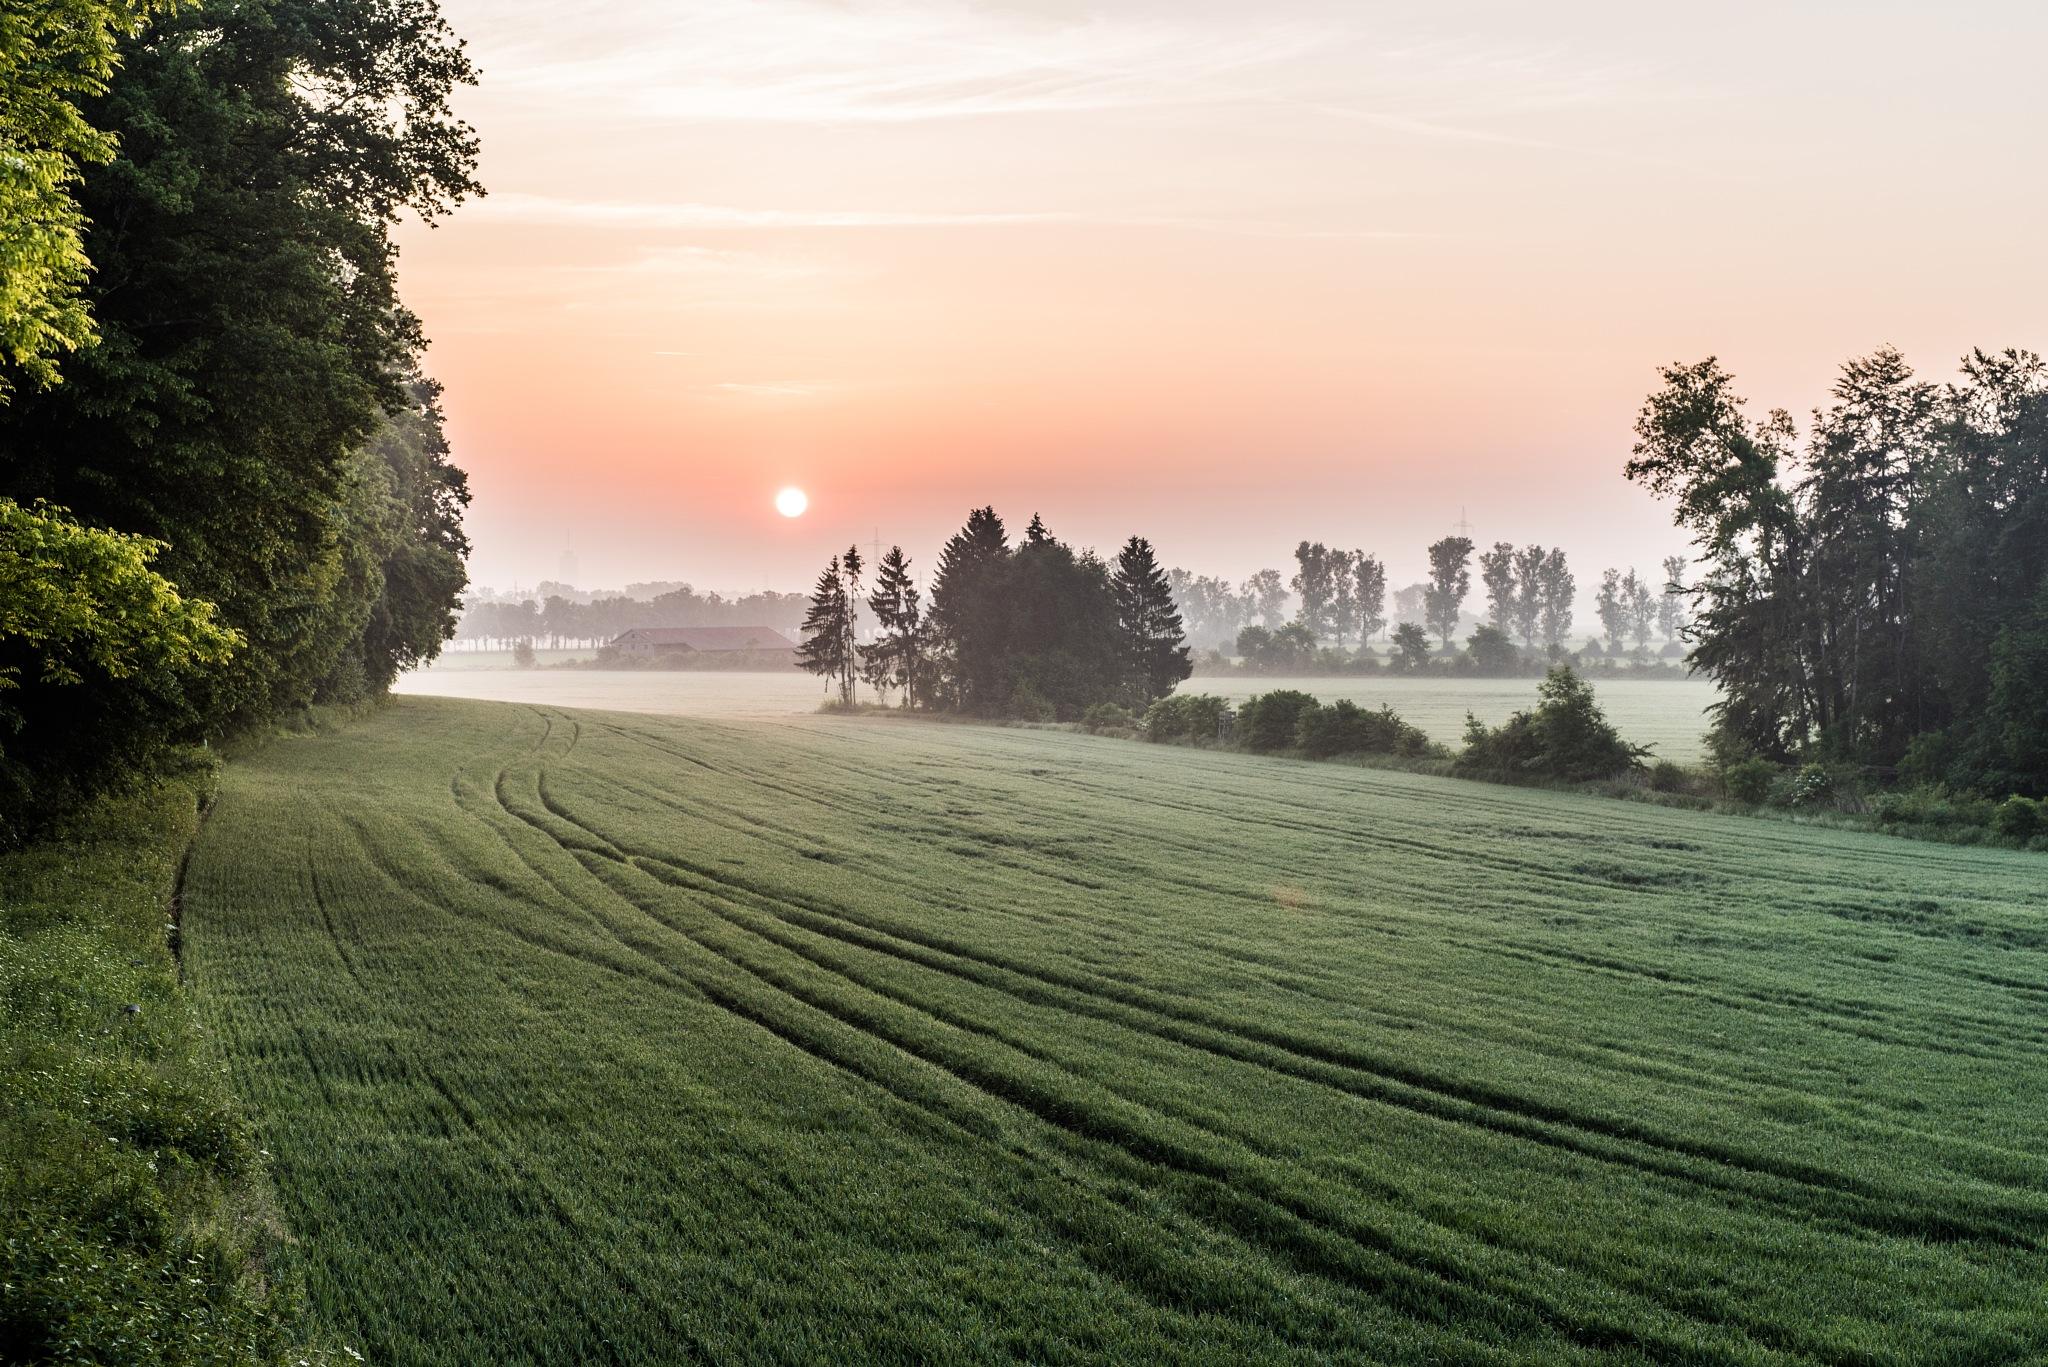 Morning - Augsburg.Germany by designgarten